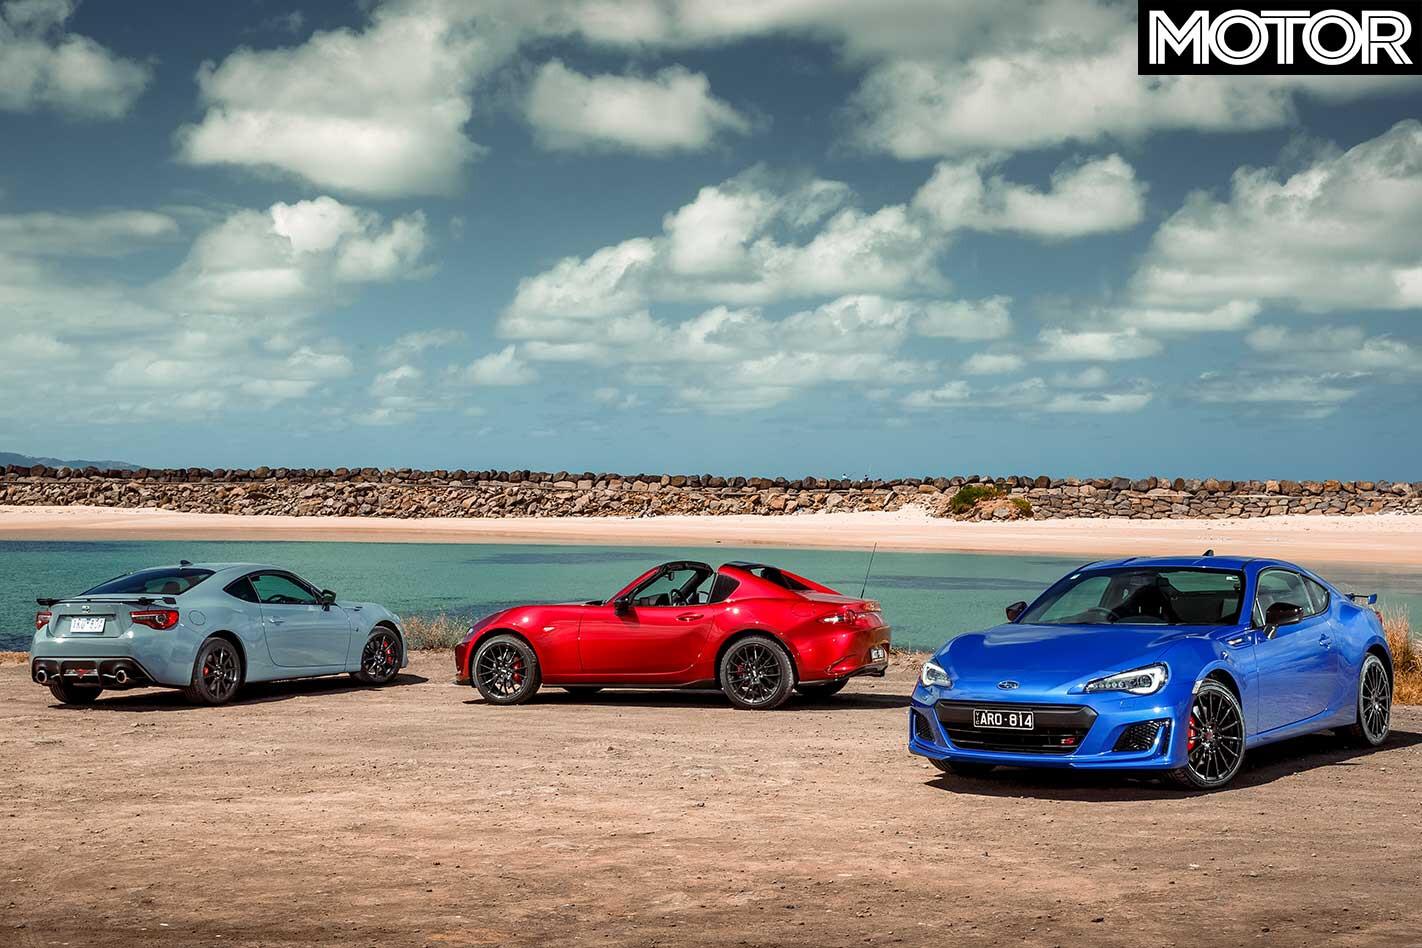 2018 Mazda Mx 5 Rf Le Vs Subaru Brz Ts Vs Toyota 86 Pp Comparison Line Up Jpg